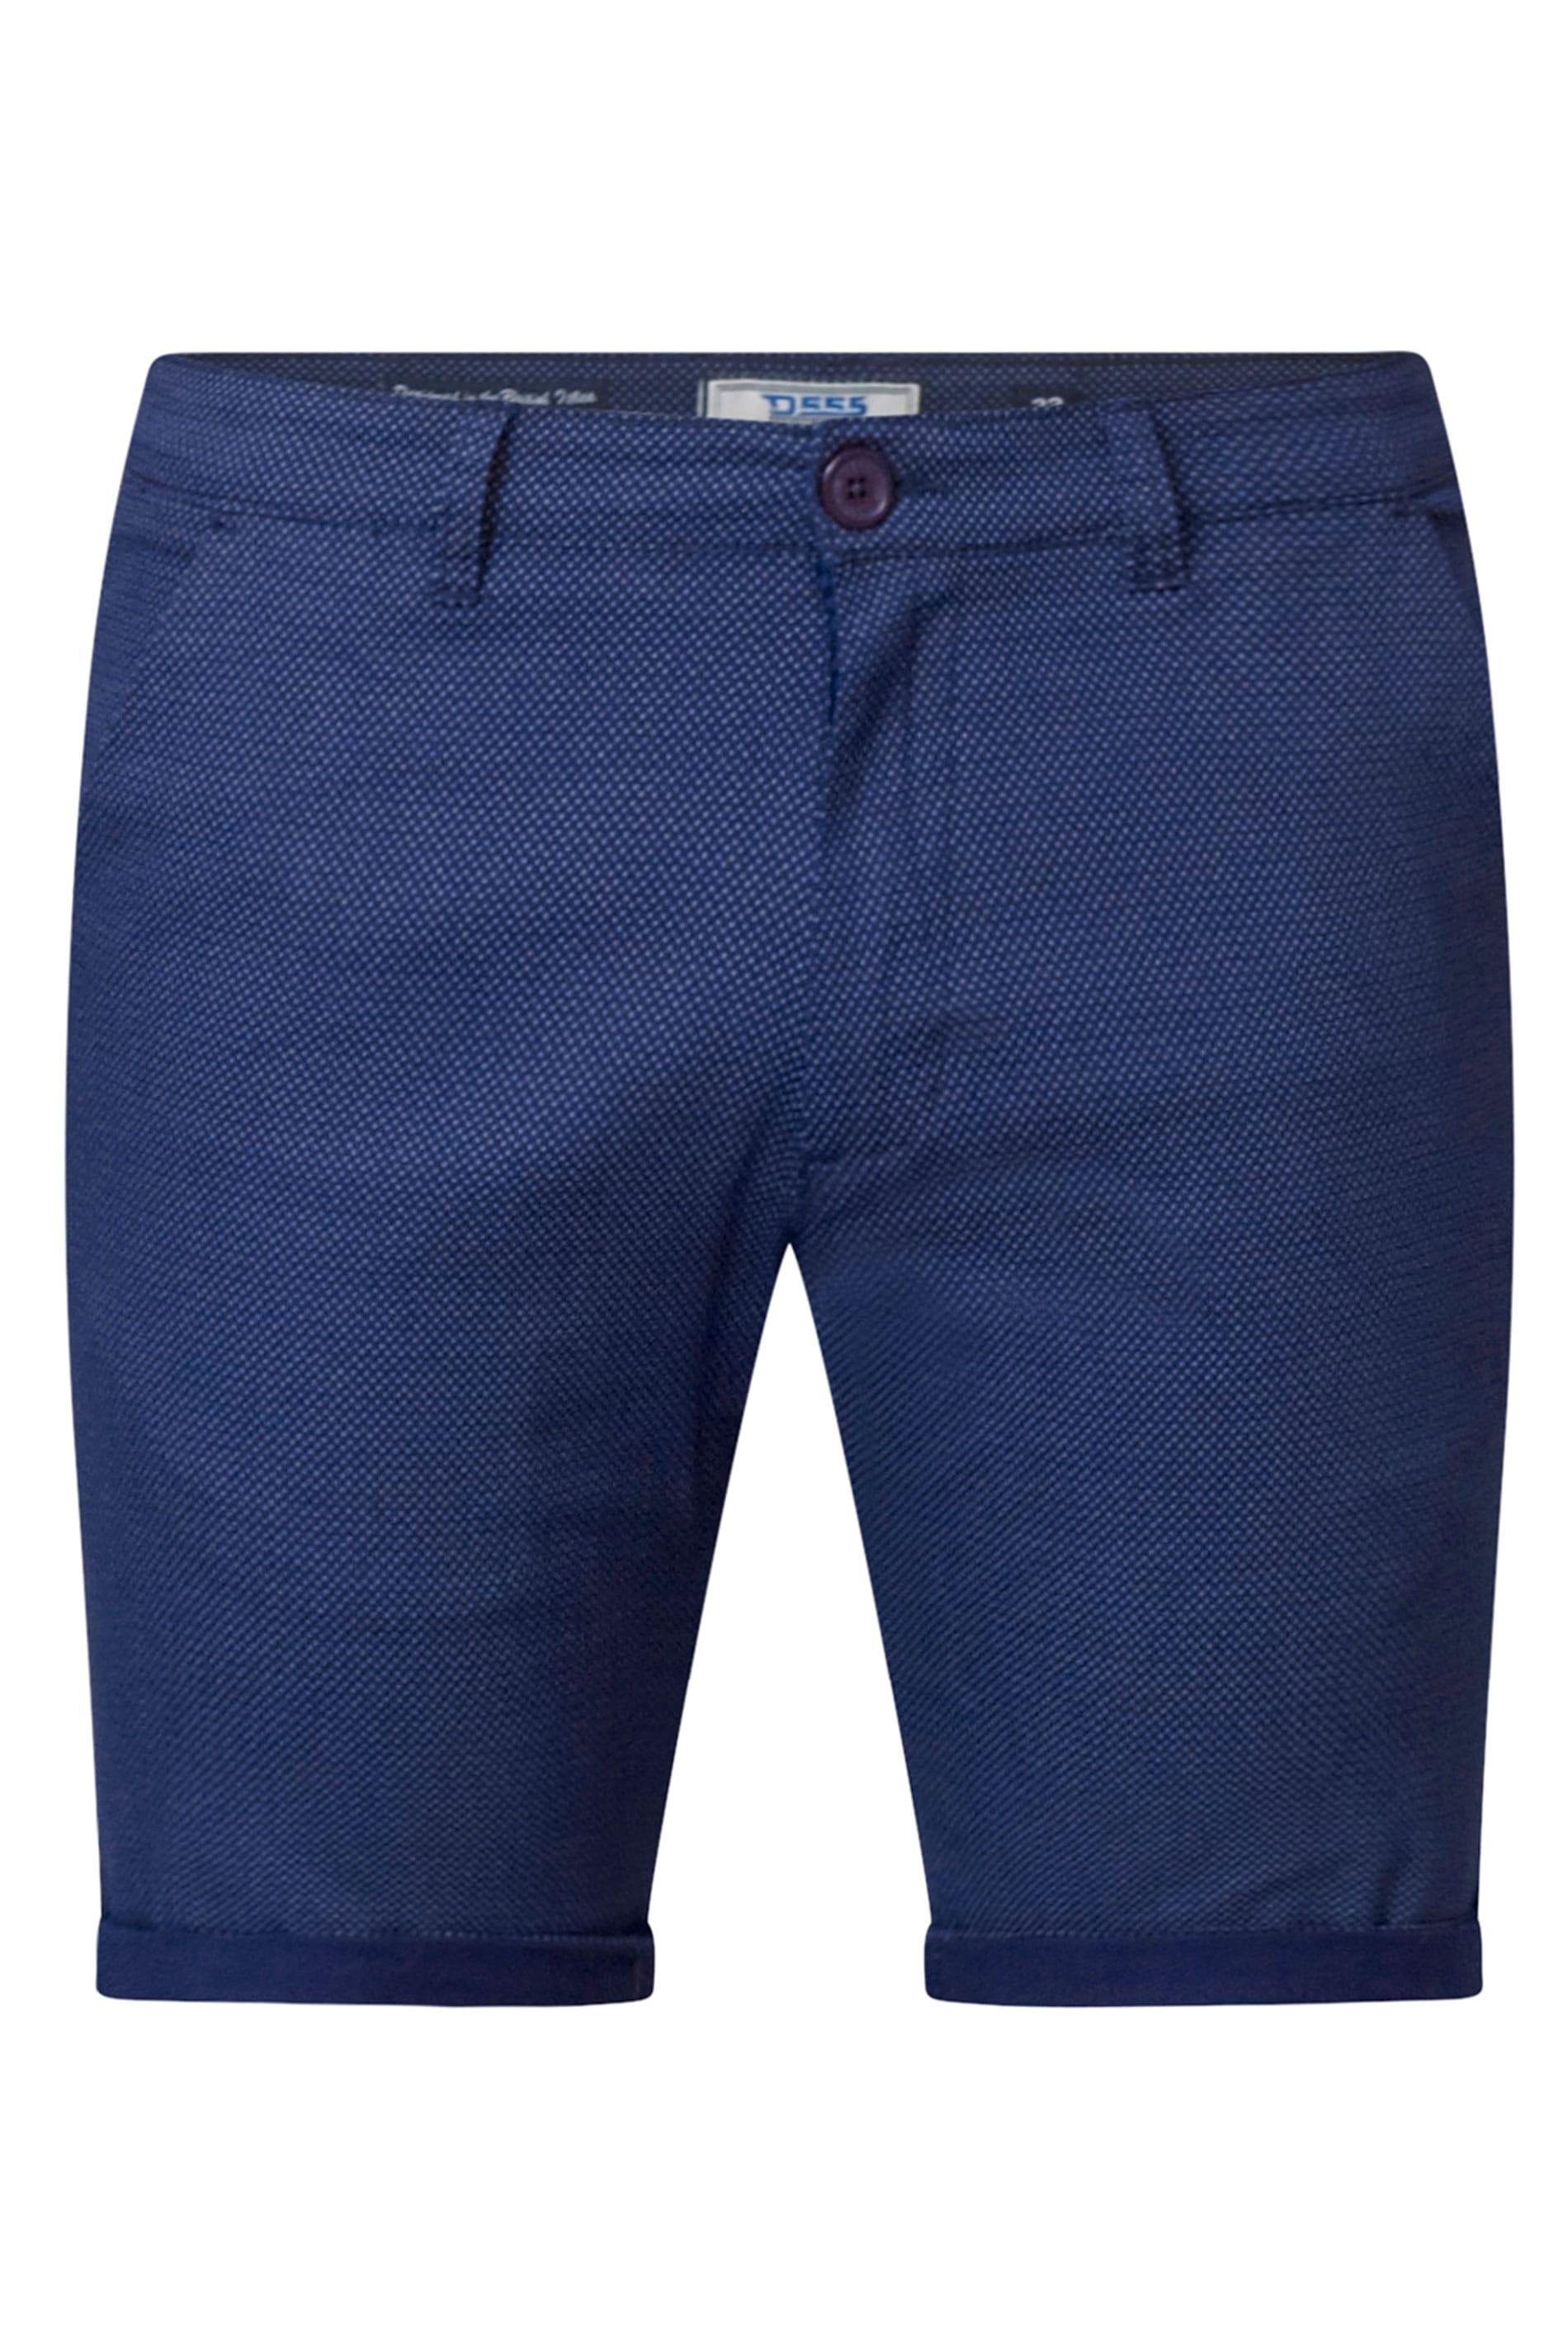 D555 Navy Chino Shorts